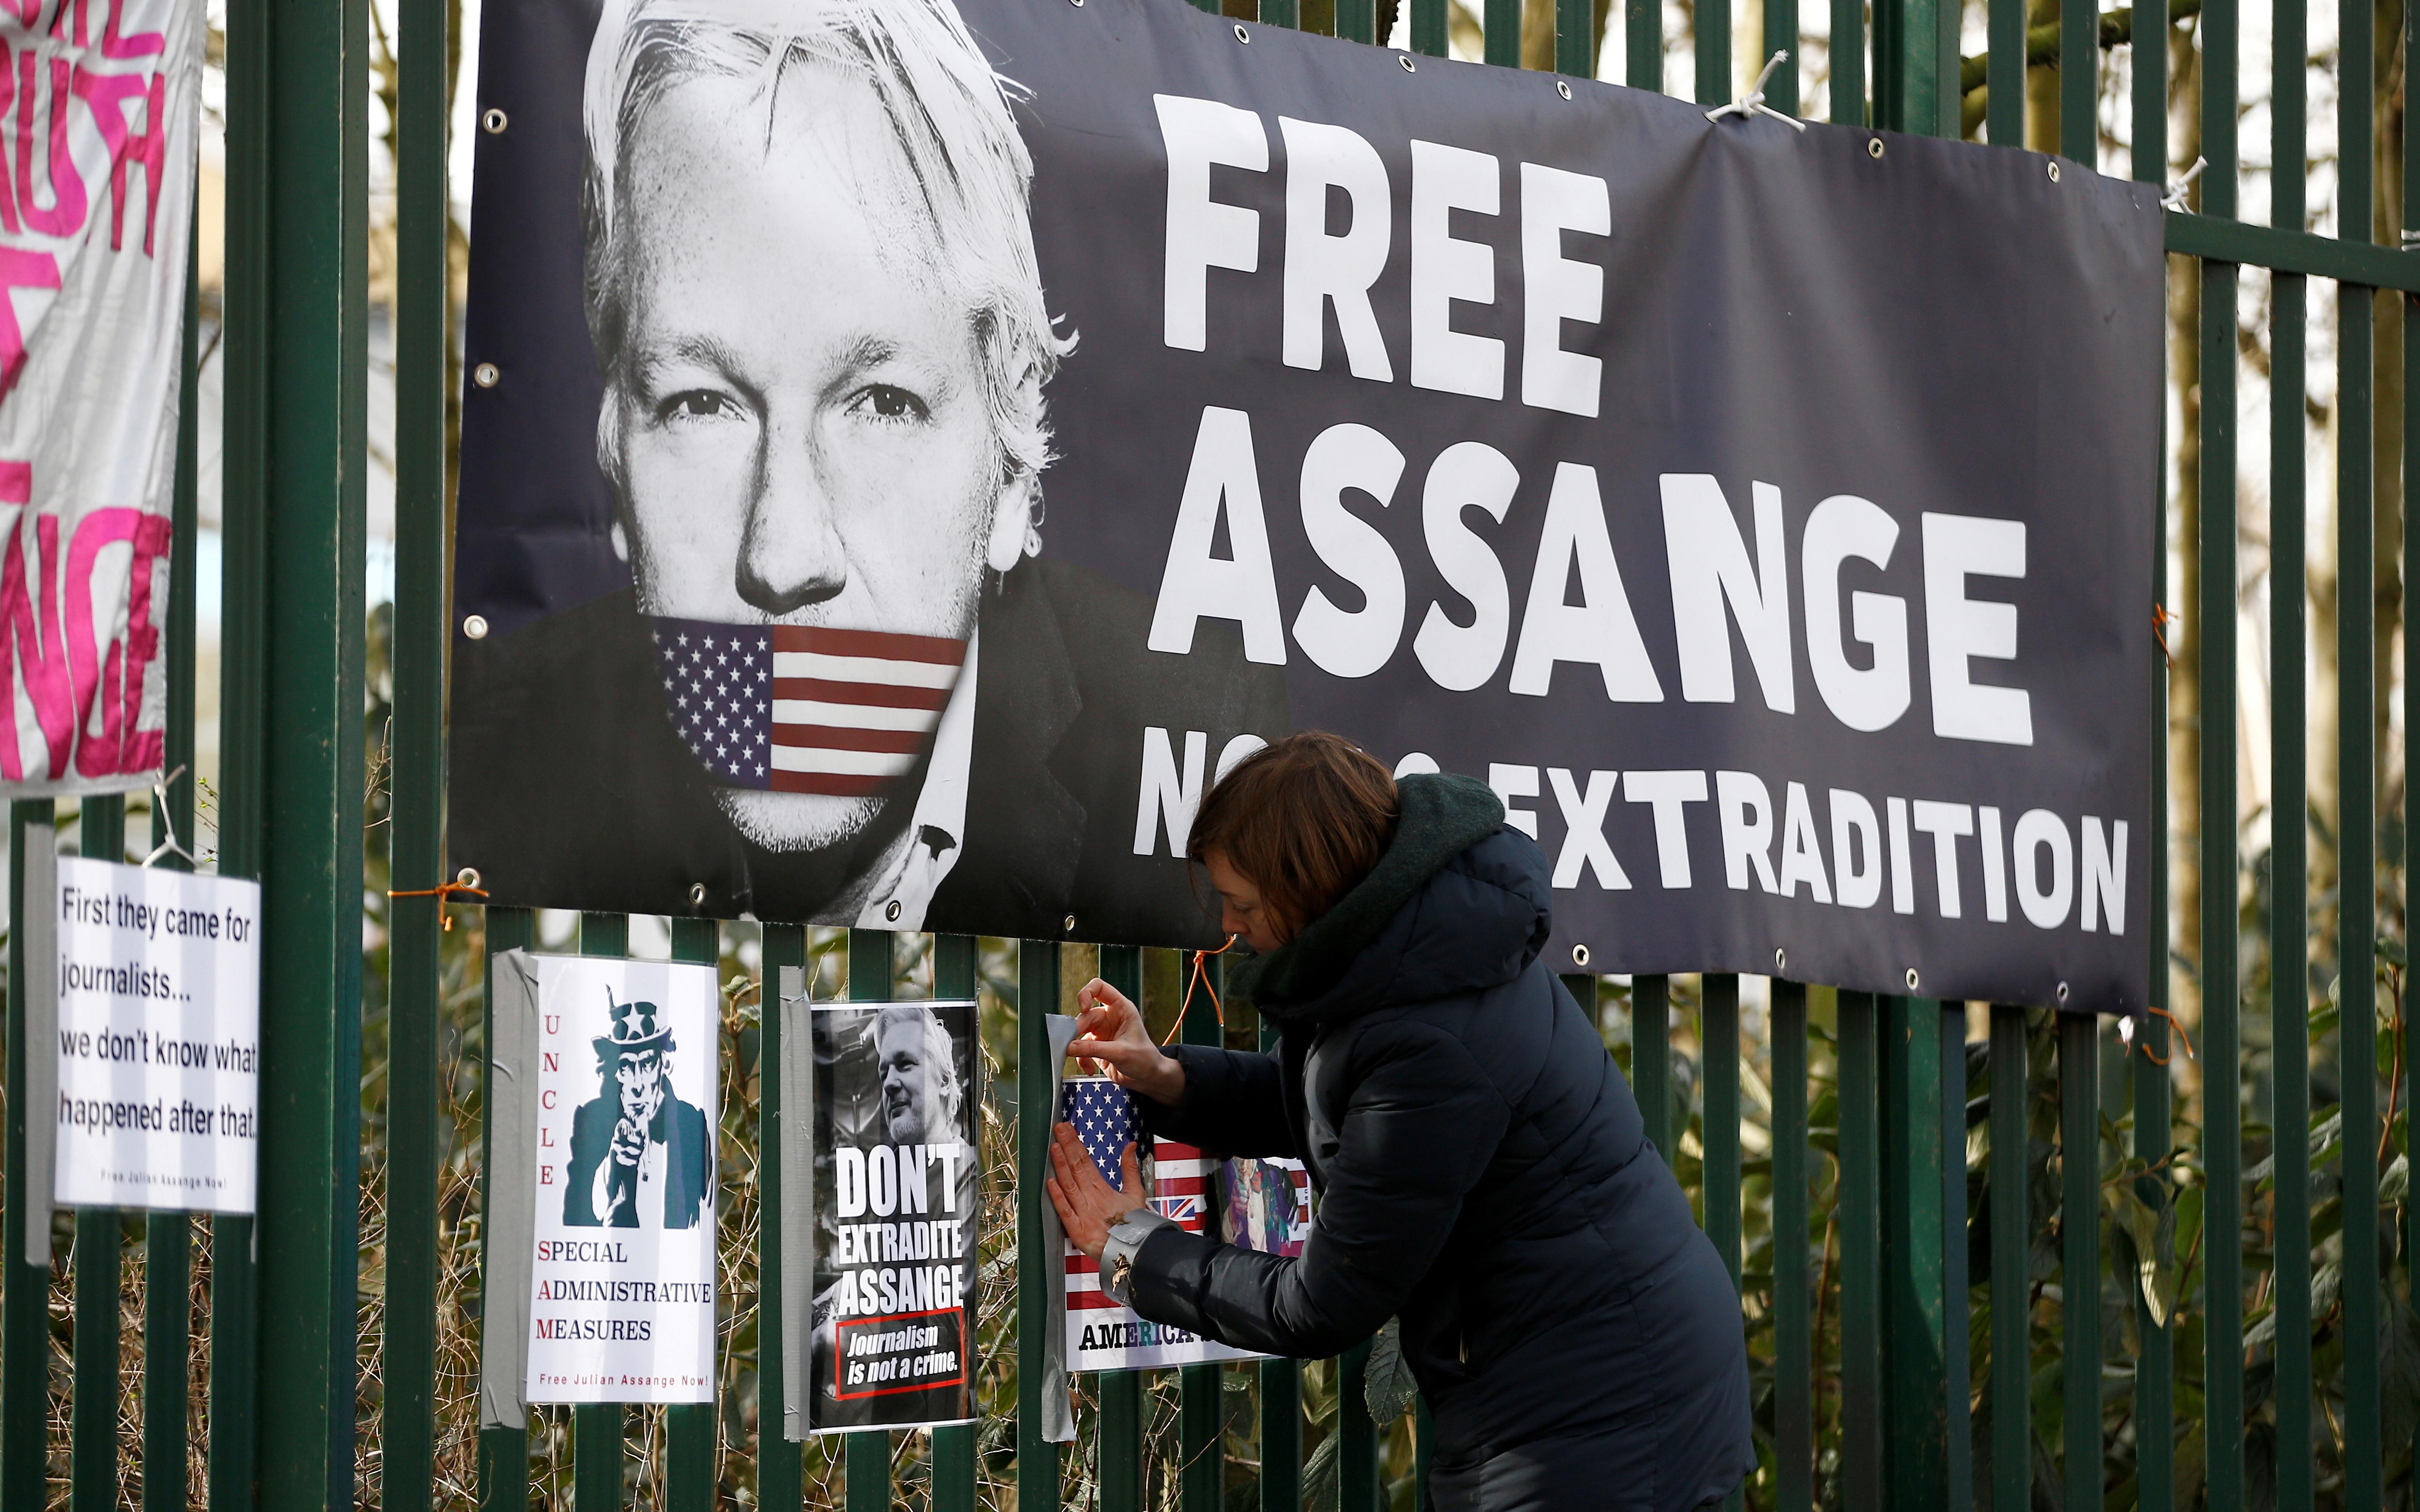 Julian Assange's case exposes British hypocrisy on press freedom